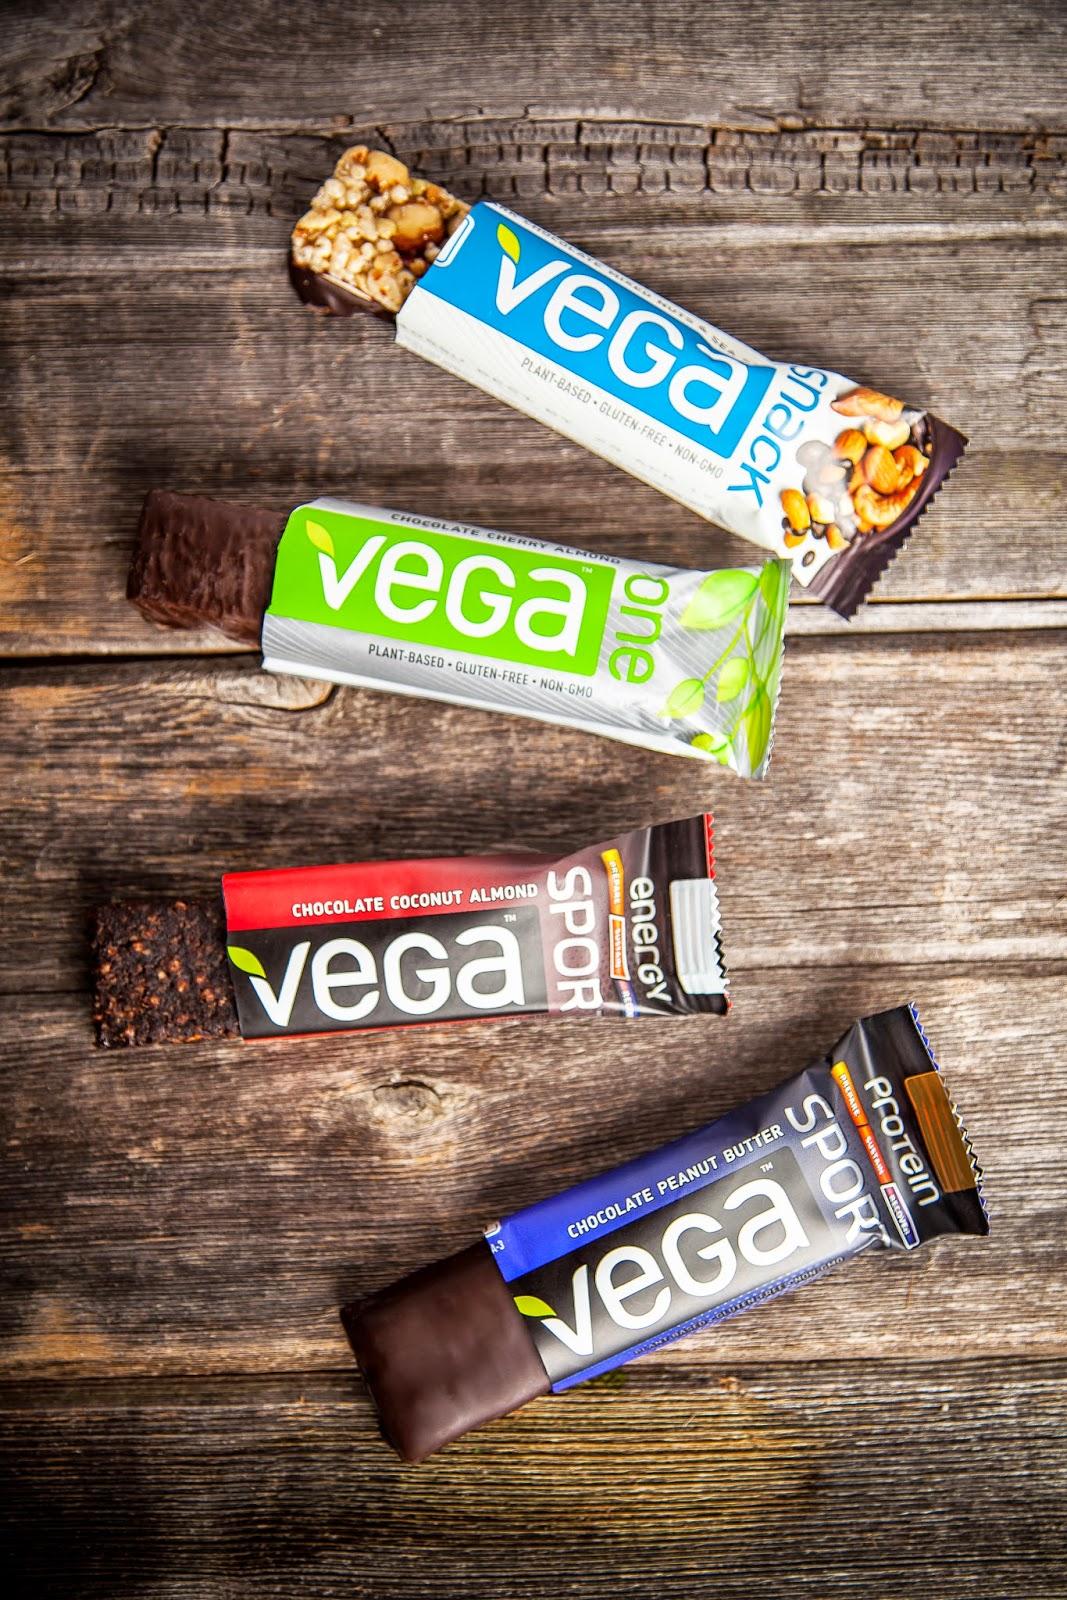 Vega Bars #vegabars #sweatpink @FitApproach @VegaTeam